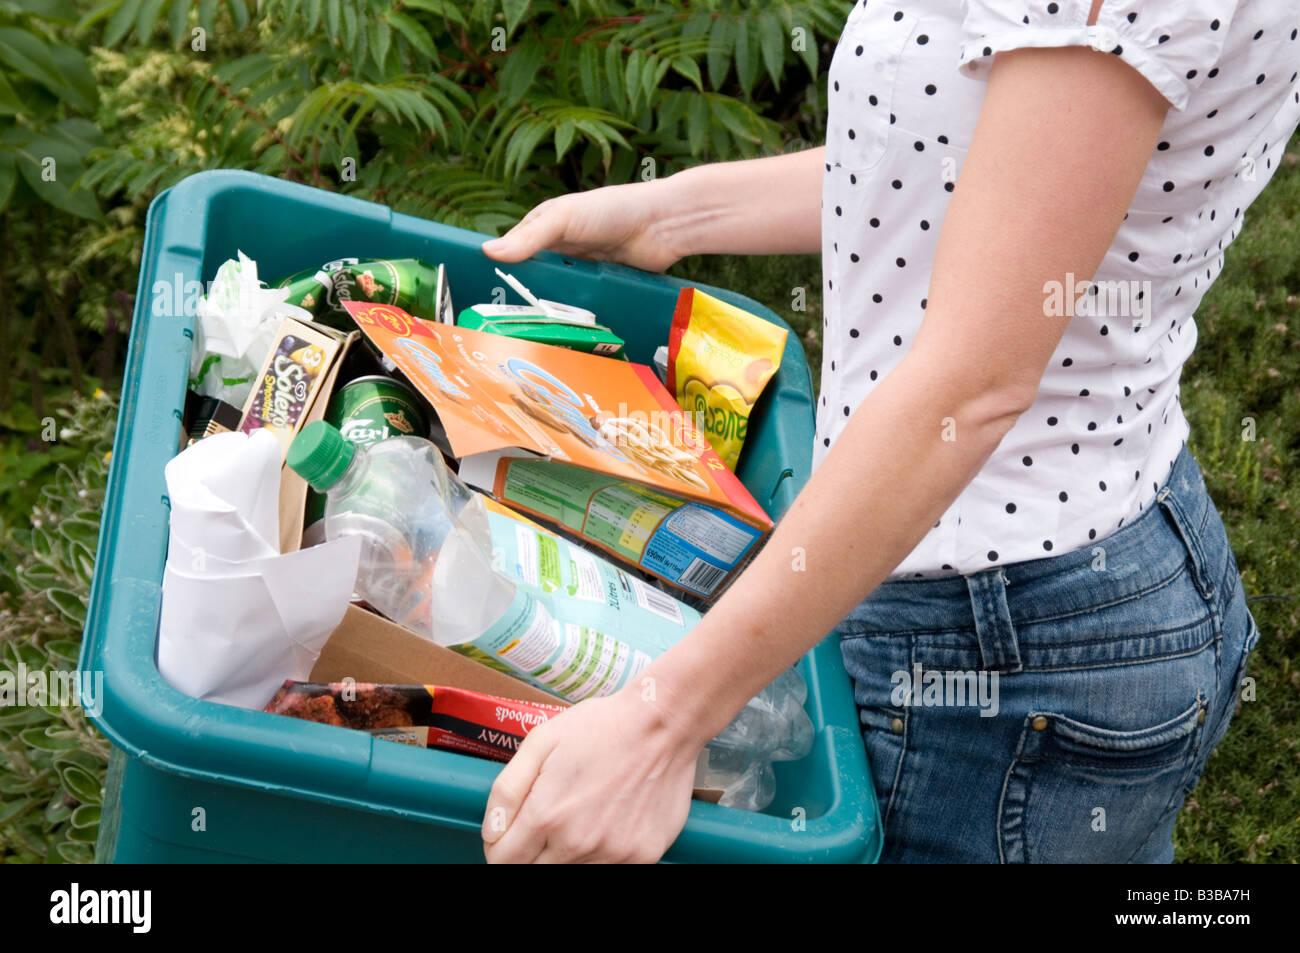 recycle recycling kerbside kerb side green box bin trash rubbish bin reusable taking out the bins boxes - Stock Image